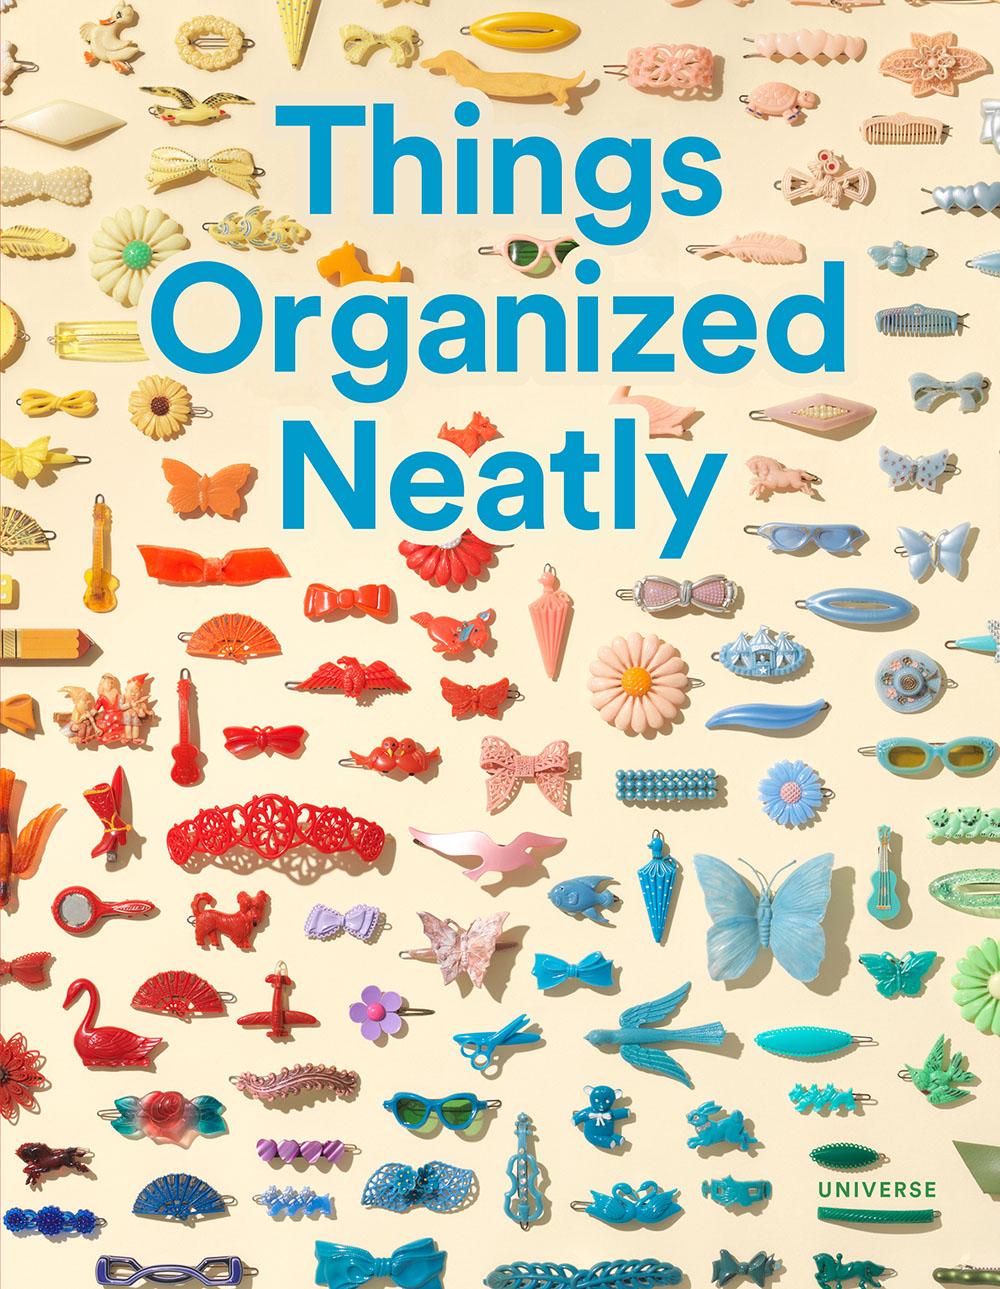 oggetti-ordine-compulsivo-things-organized-neatly-1